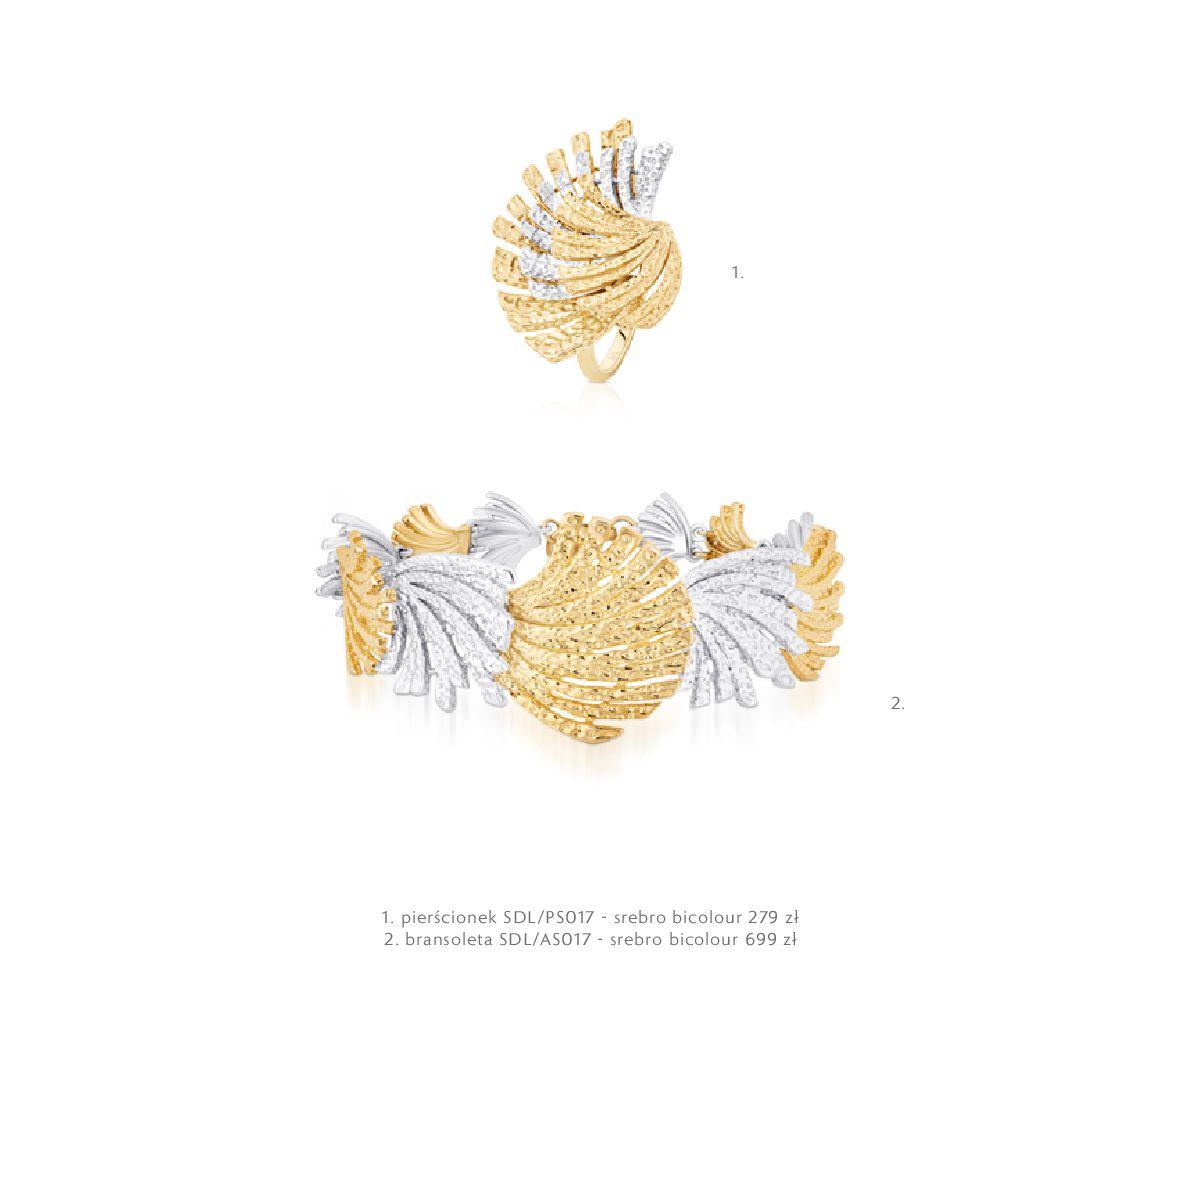 Gazetka W. KRUK: Katalog - Kolekcja Blask 2021-02-17 page-27